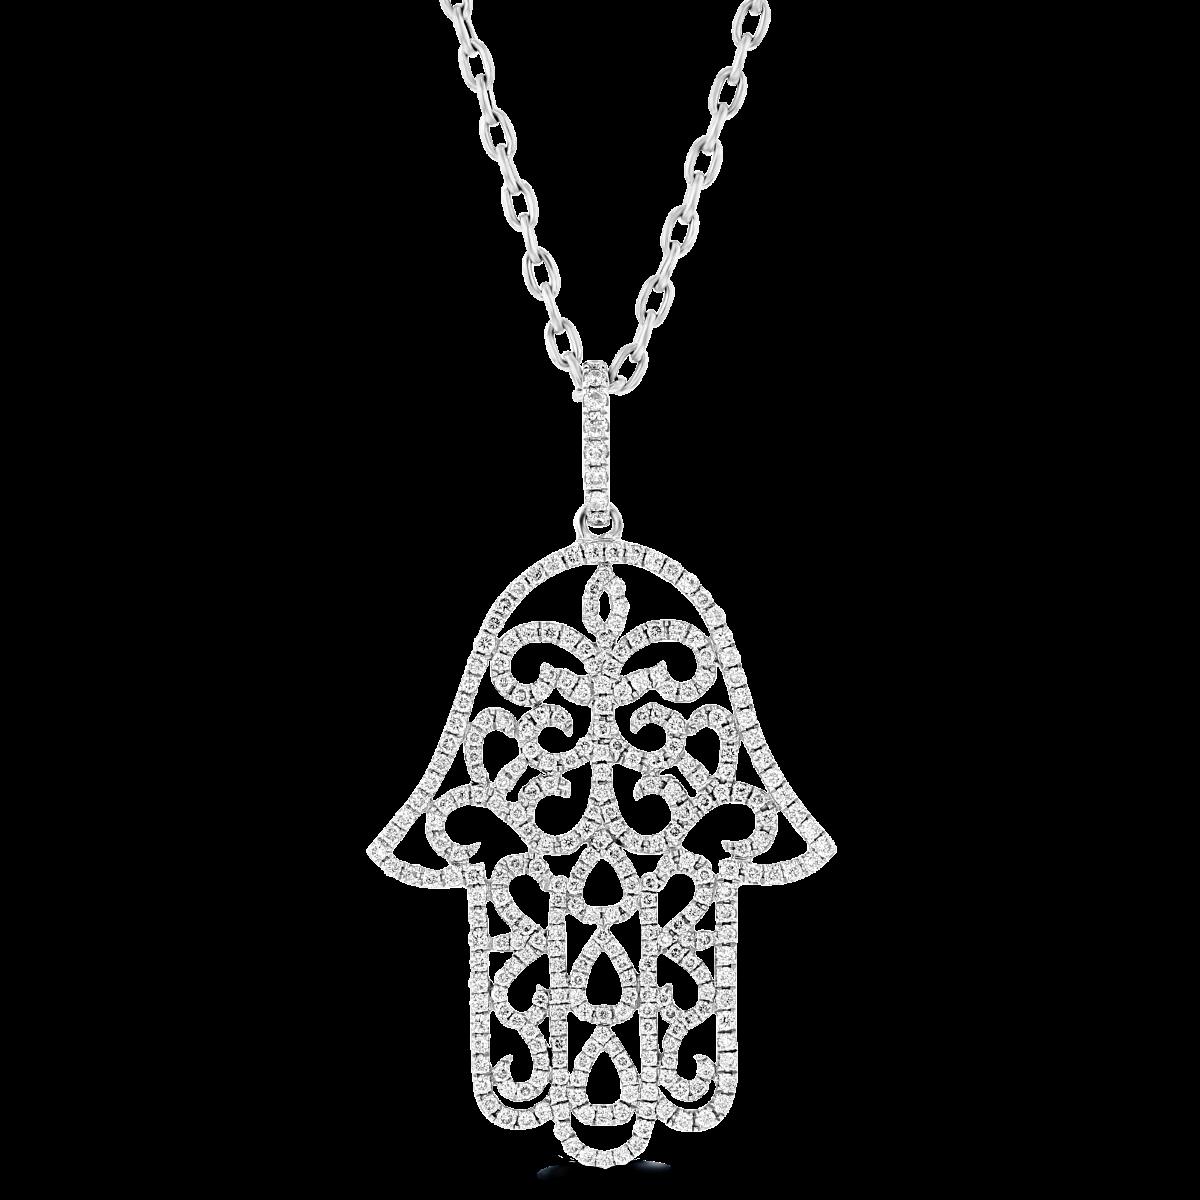 adb51e41e 18 Karat White Gold Pave Diamond Hamsa Pendant With 18